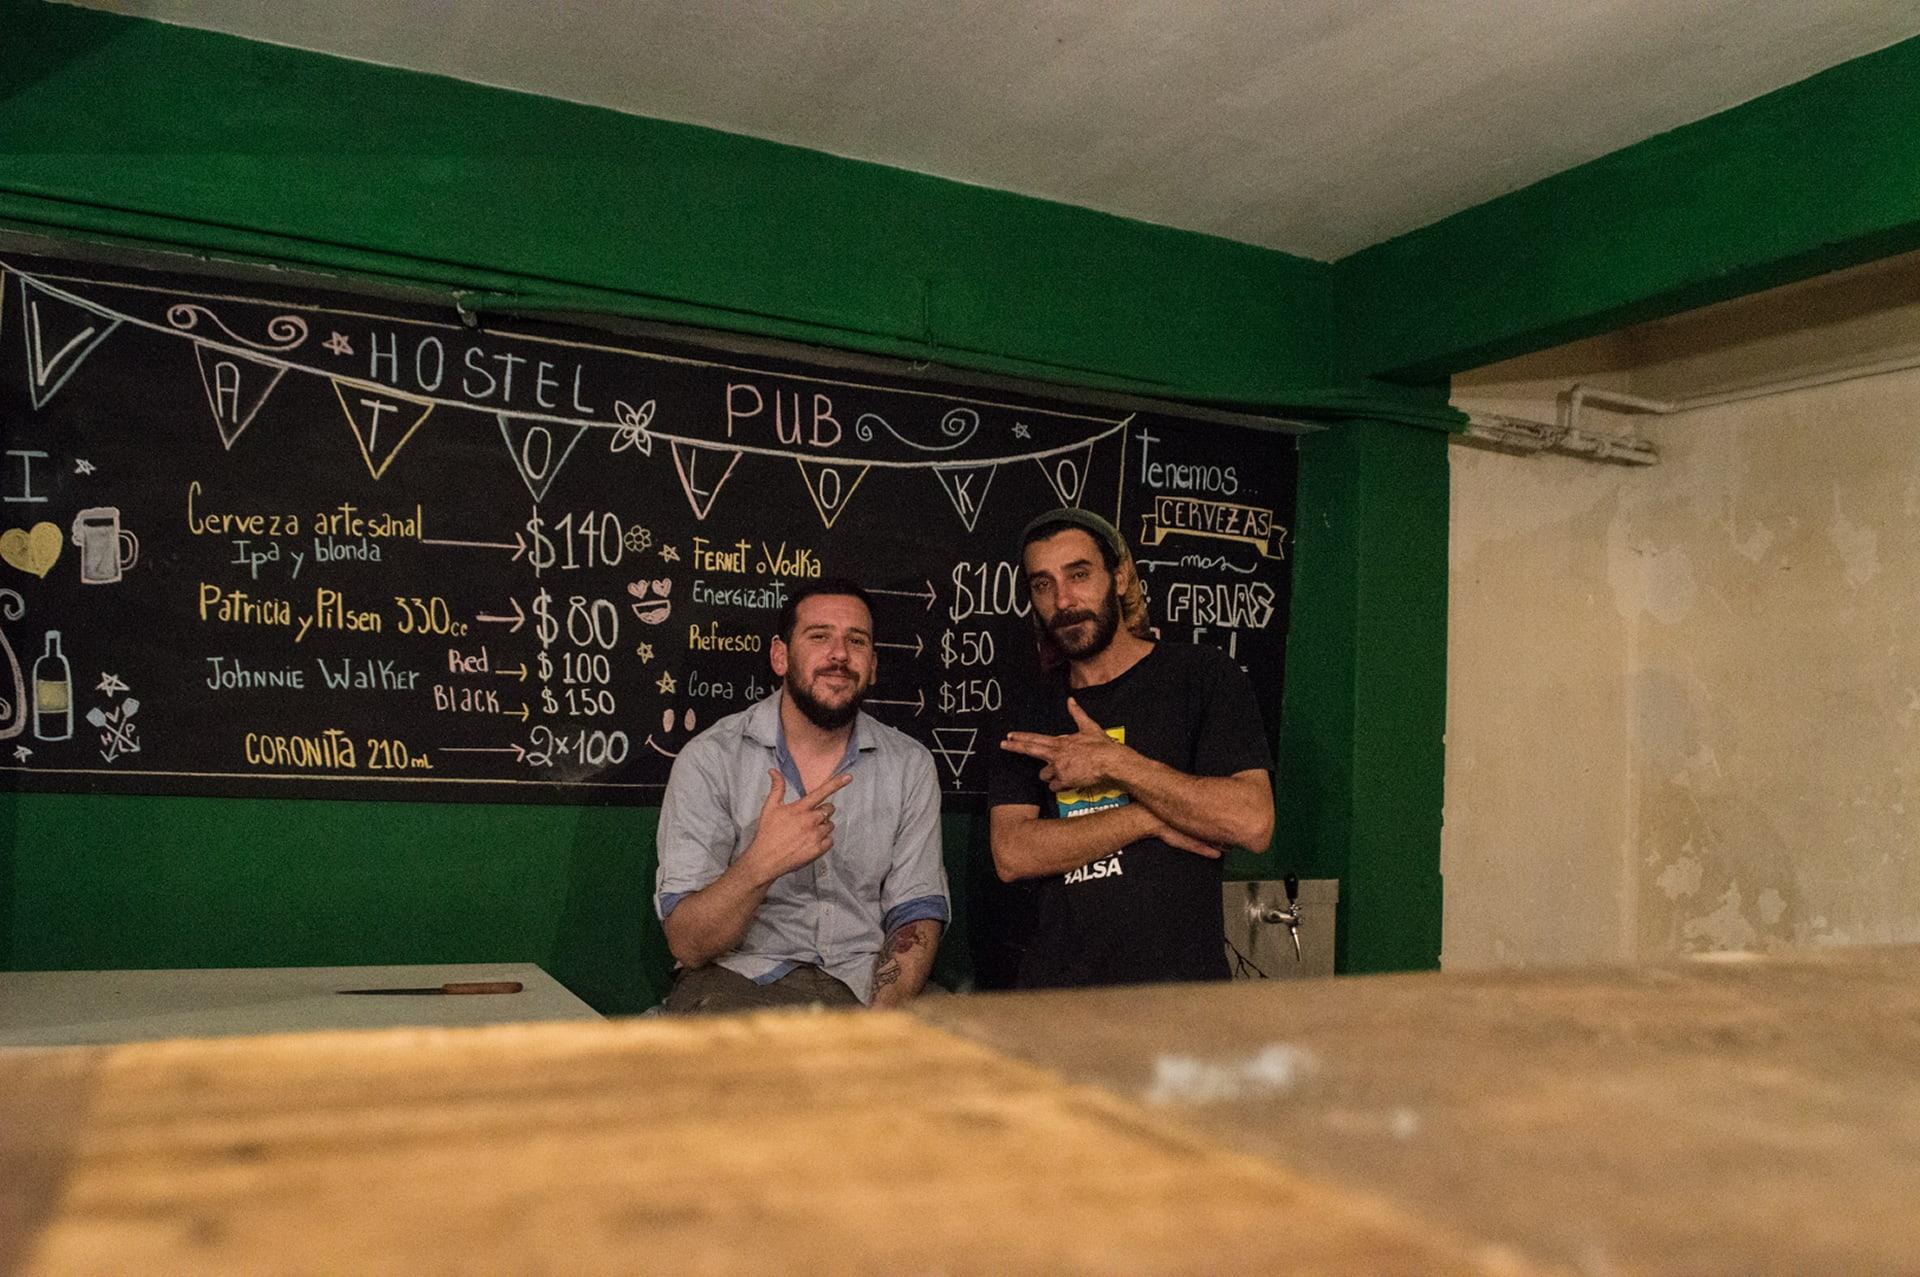 HOSTEL - Vato Loko Hostel Pub